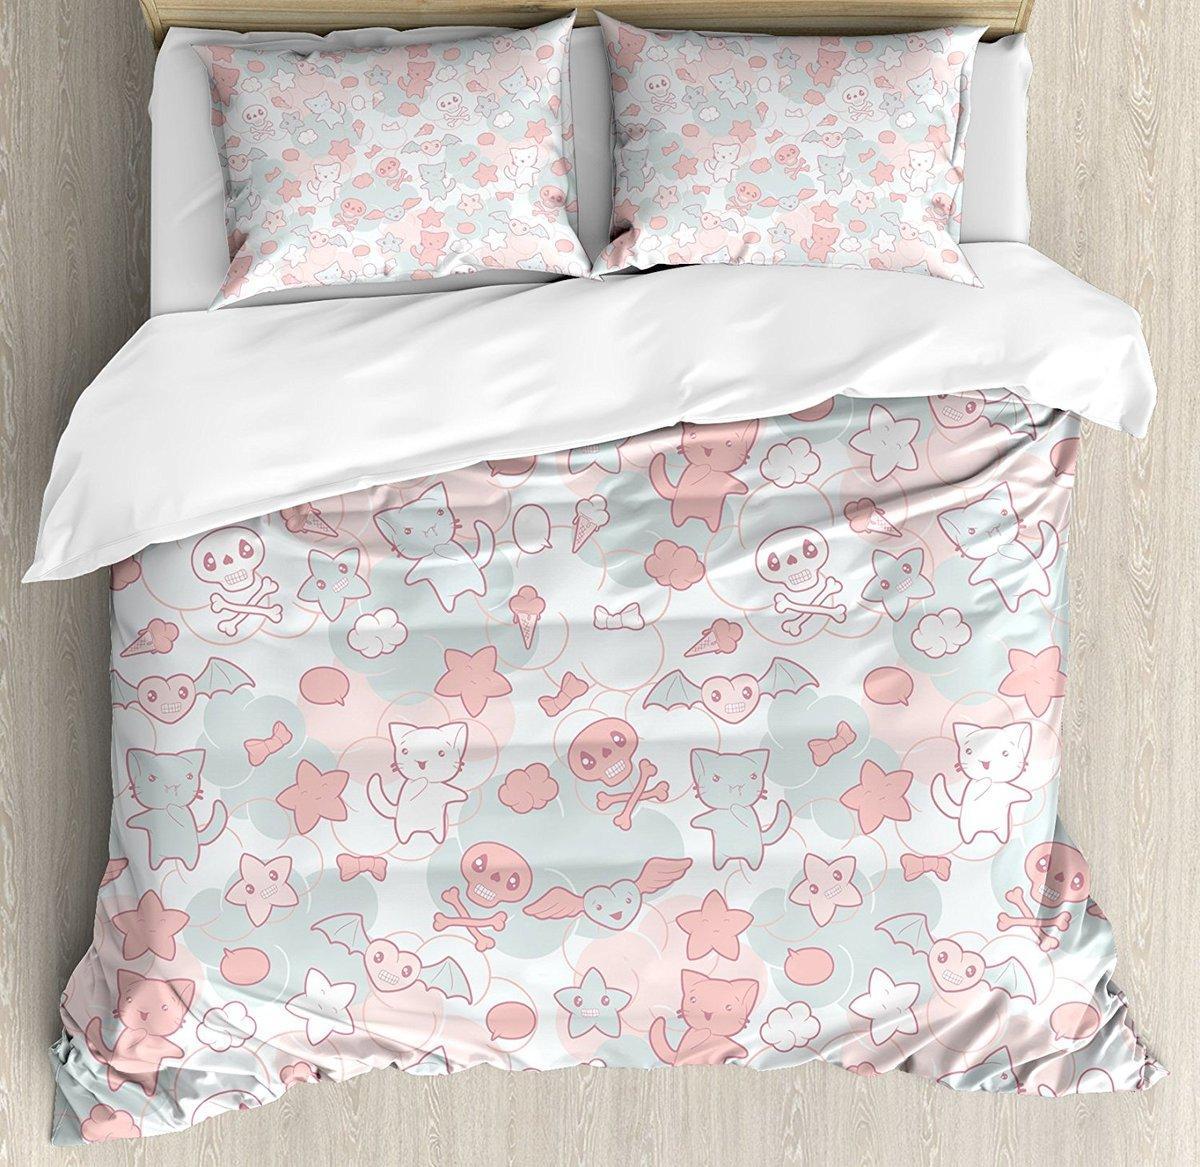 Doodle Duvet Cover Set Cartoon Styled Cute Cats Bats And Skulls Japanese  Inspired Kawaii Design Decorative Bedding Set Grey Bedding Boys Bedding  From Yong8 68d5404cd